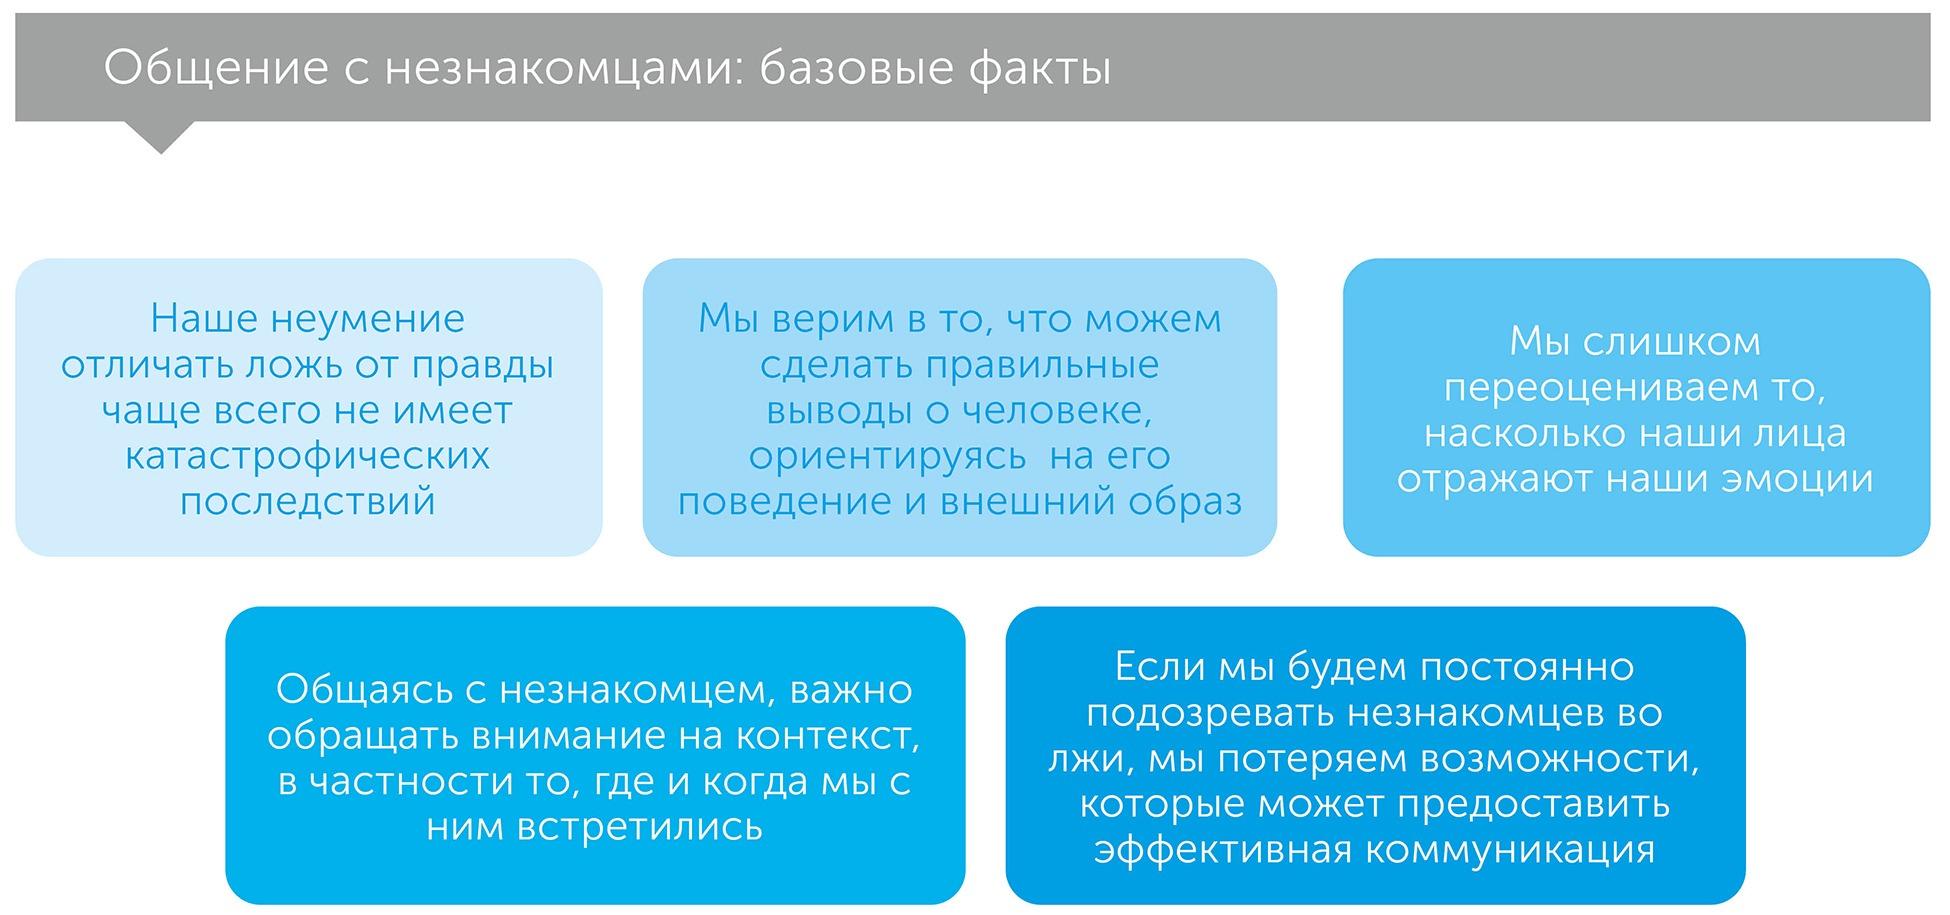 Разговор с незнакомцами, author Малкольм Гладуэлл   Kyivstar Business Hub, image №2